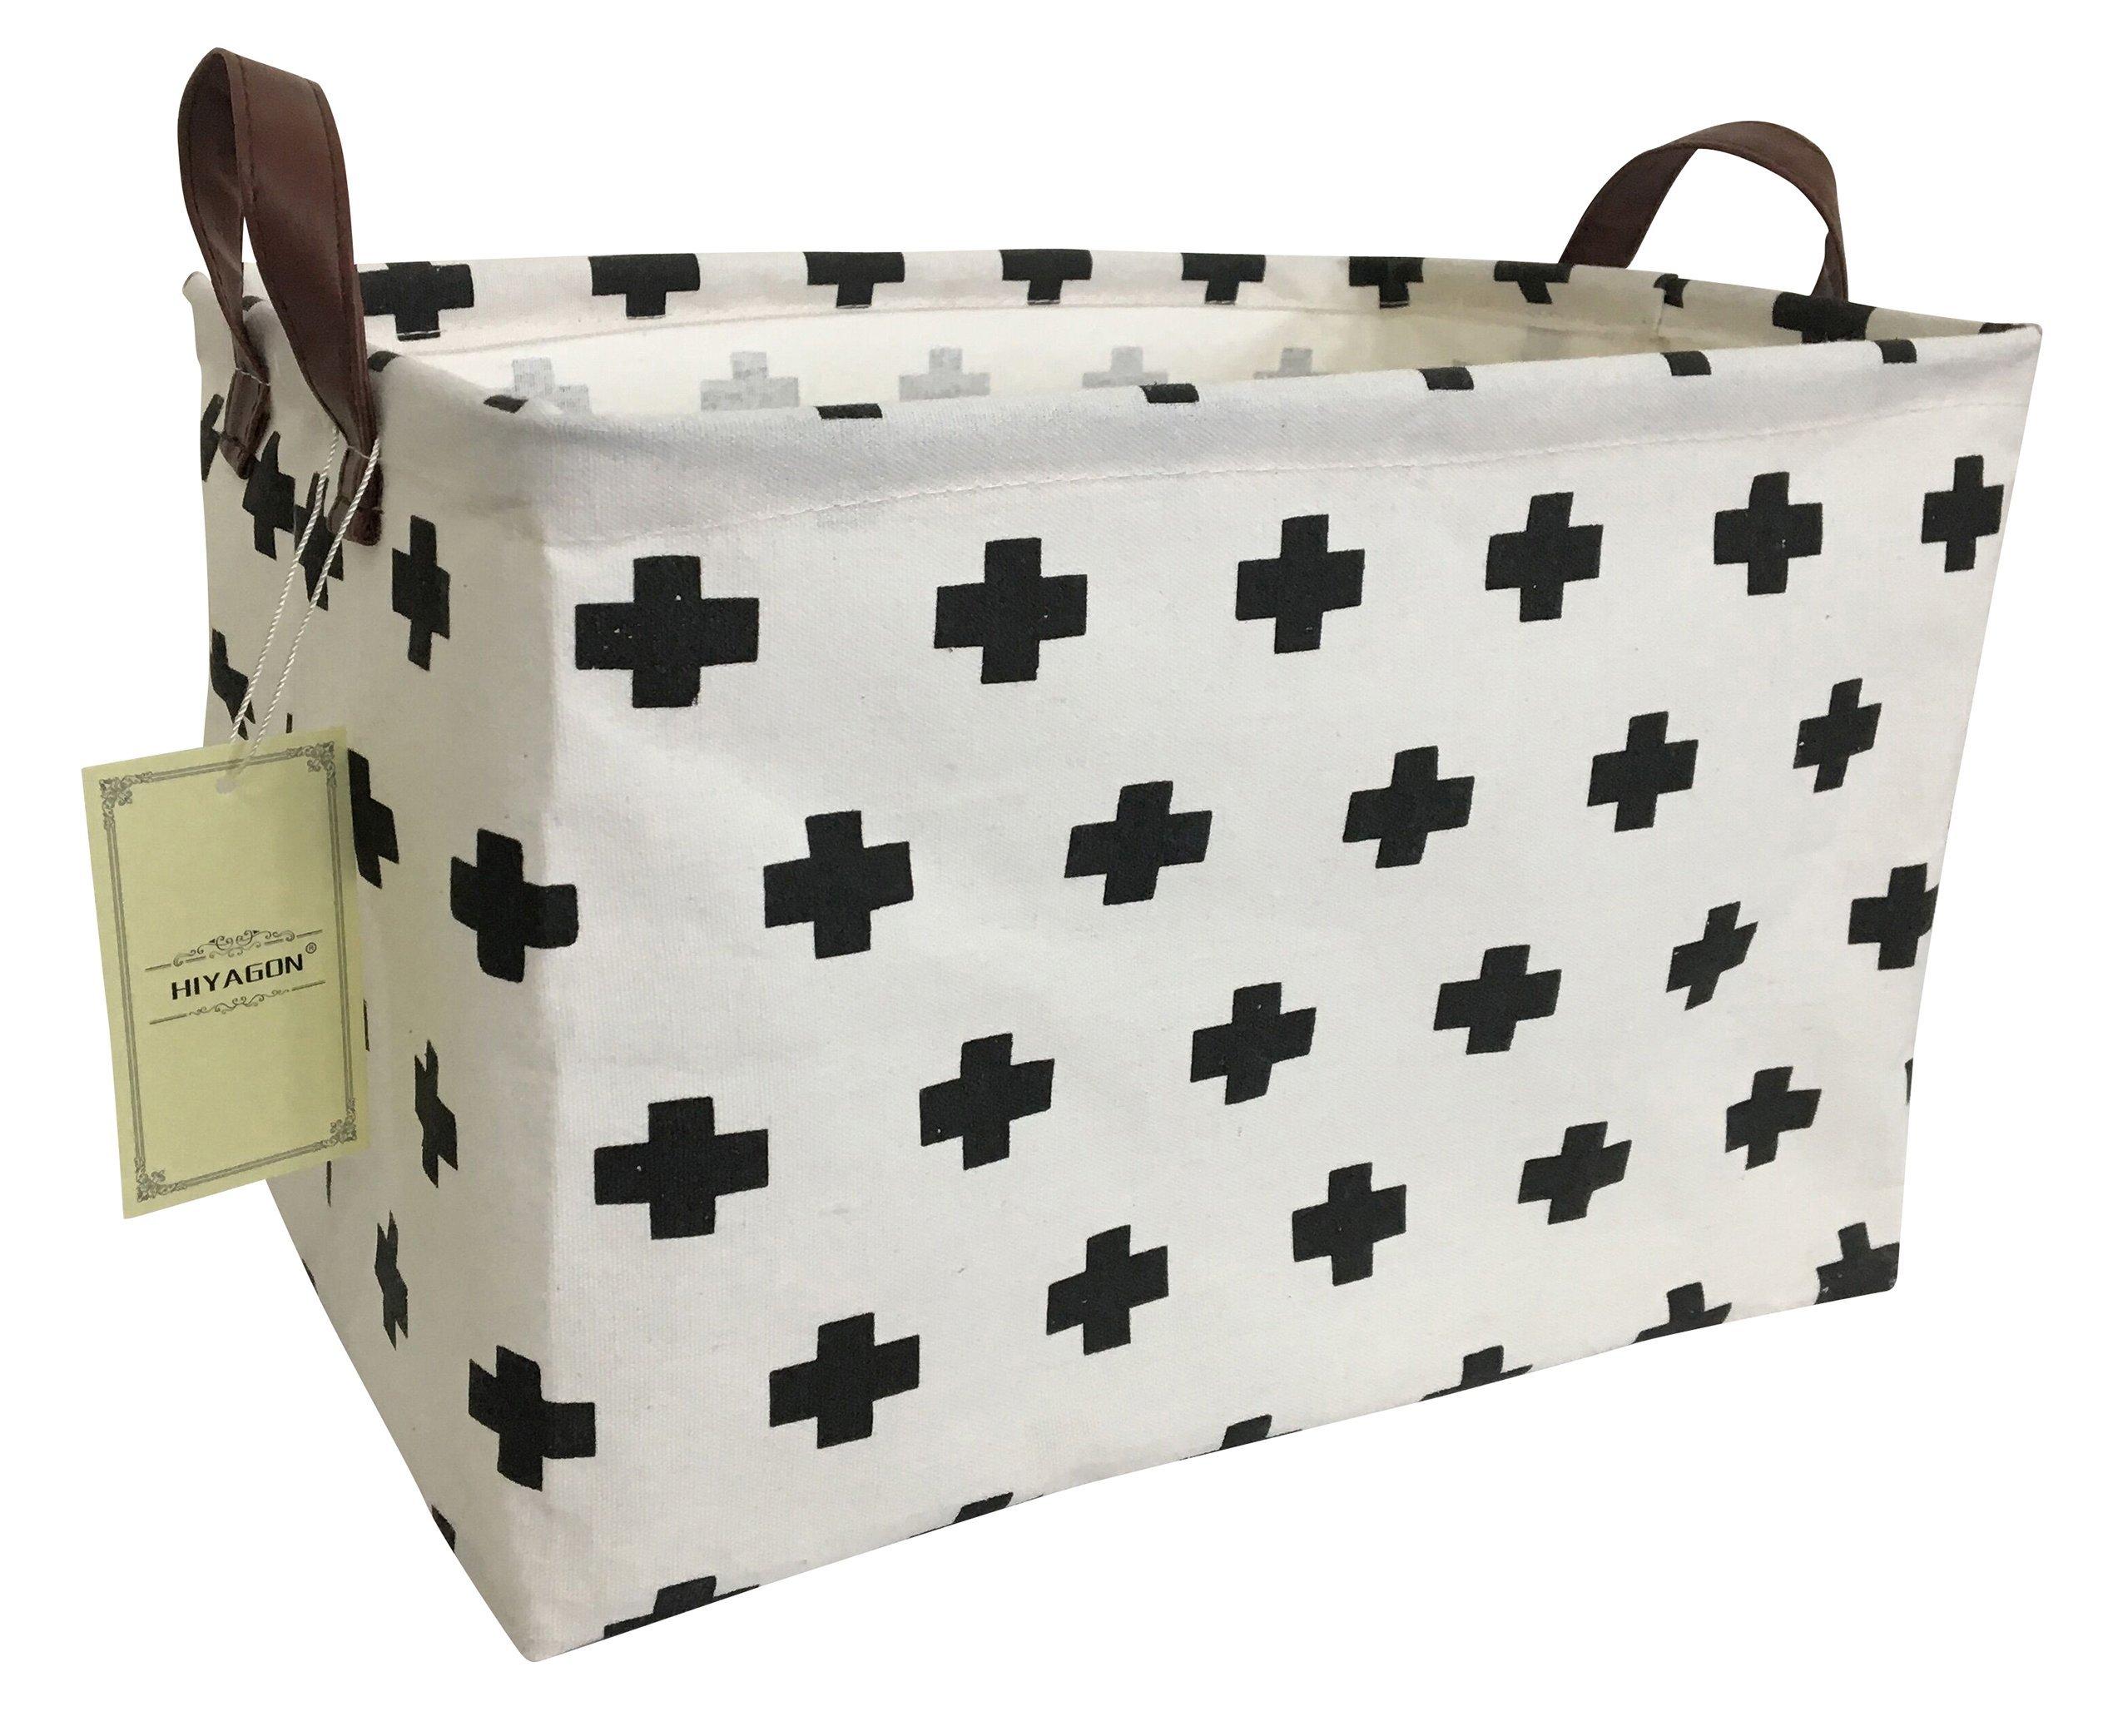 Square Collapsible Canvas Storage Box Foldable Kids Toys: Amazon.com : HIYAGON Rectangular Storage Box Basket For